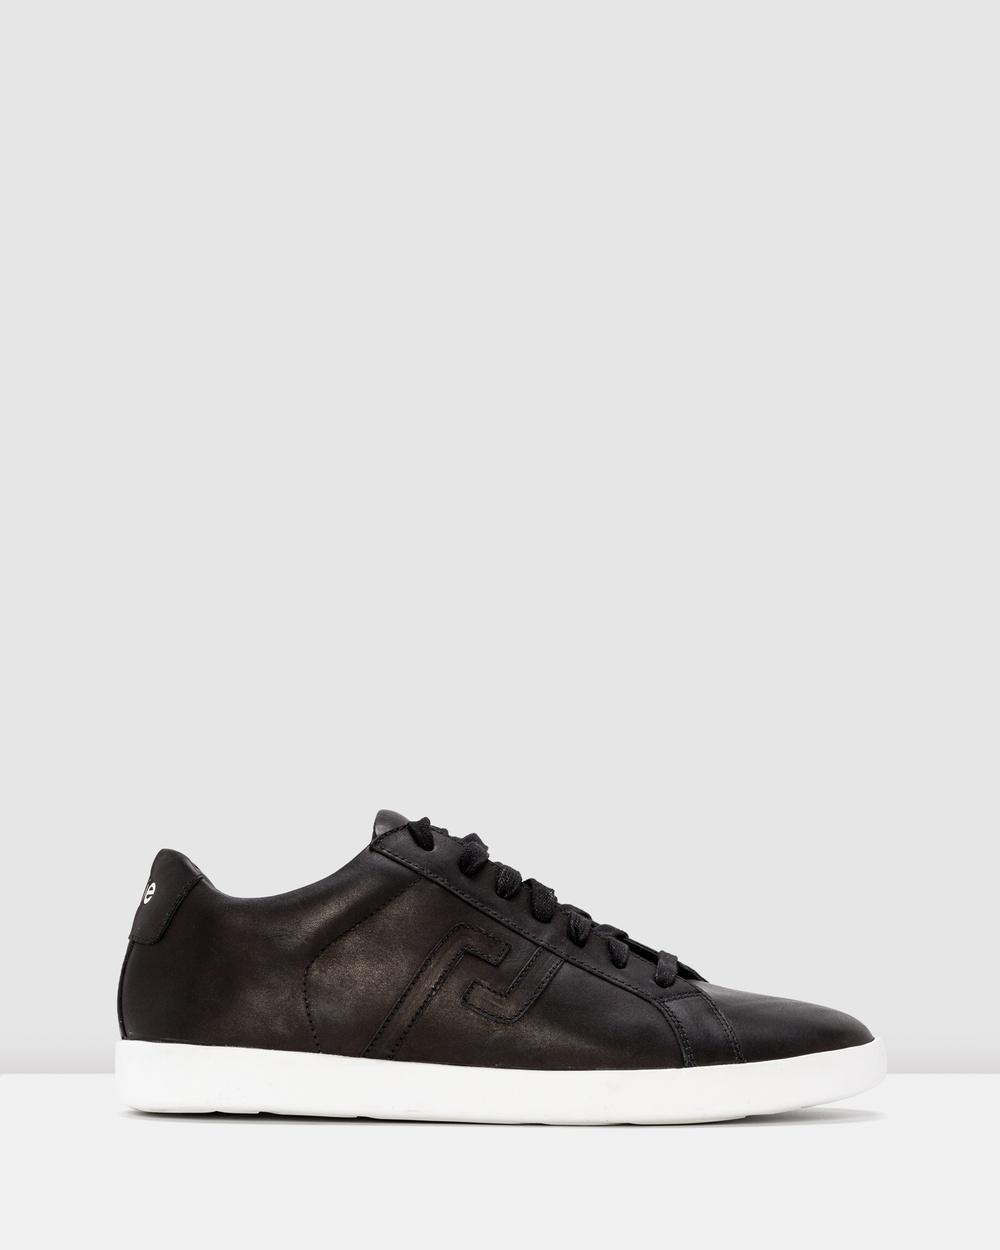 Rollie Prime Mens Sneakers Lifestyle Black Australia